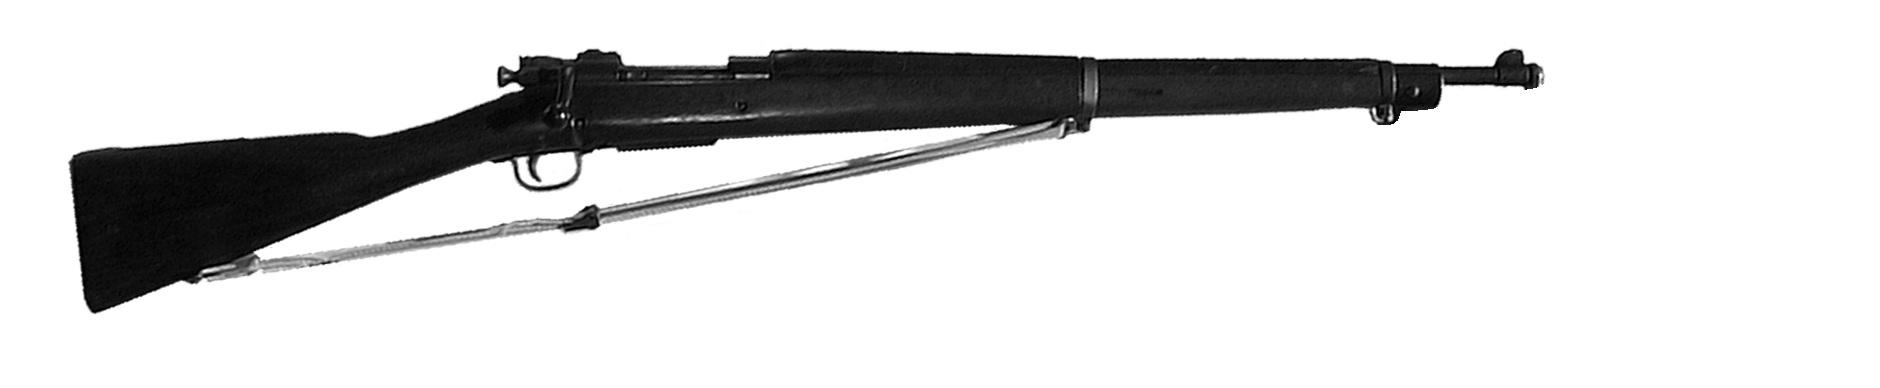 Pssst  Hey Buddy, wanna buy an M1903? | The DrillMaster